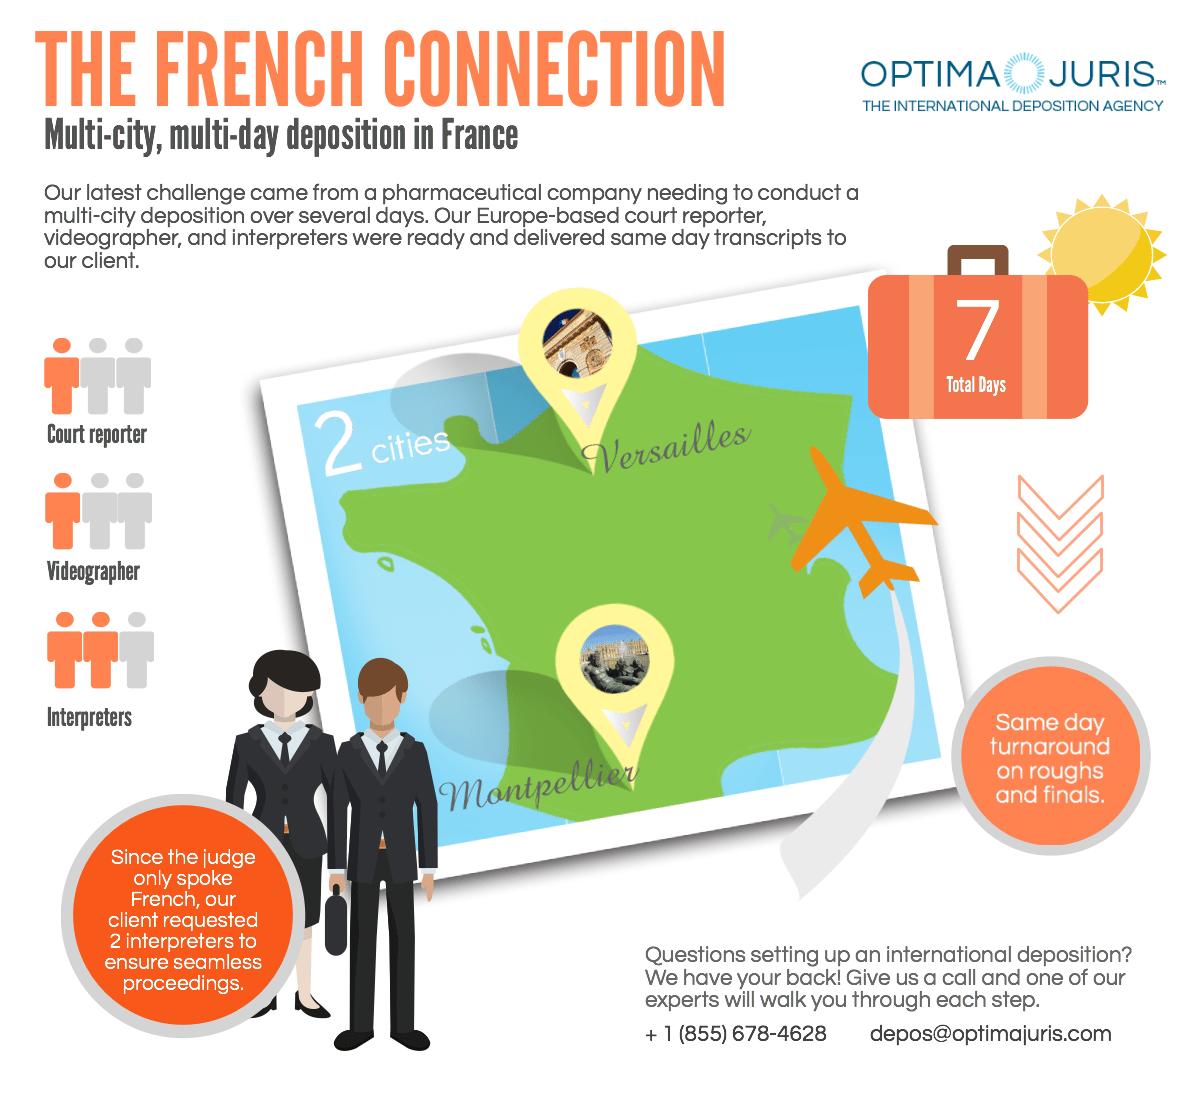 Deposition in France